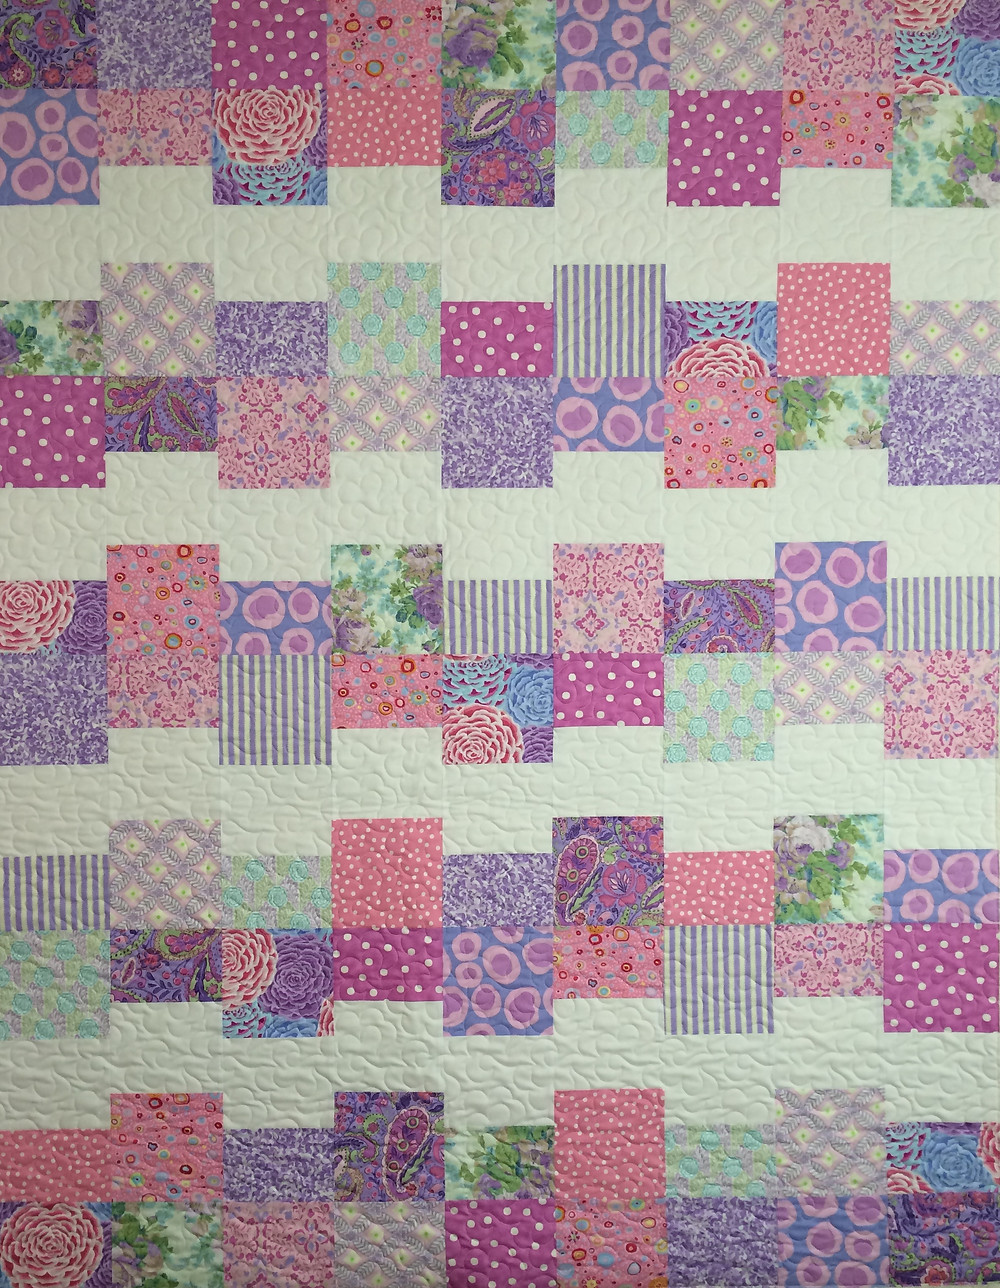 cloud 9 quilt in spring color fabrics